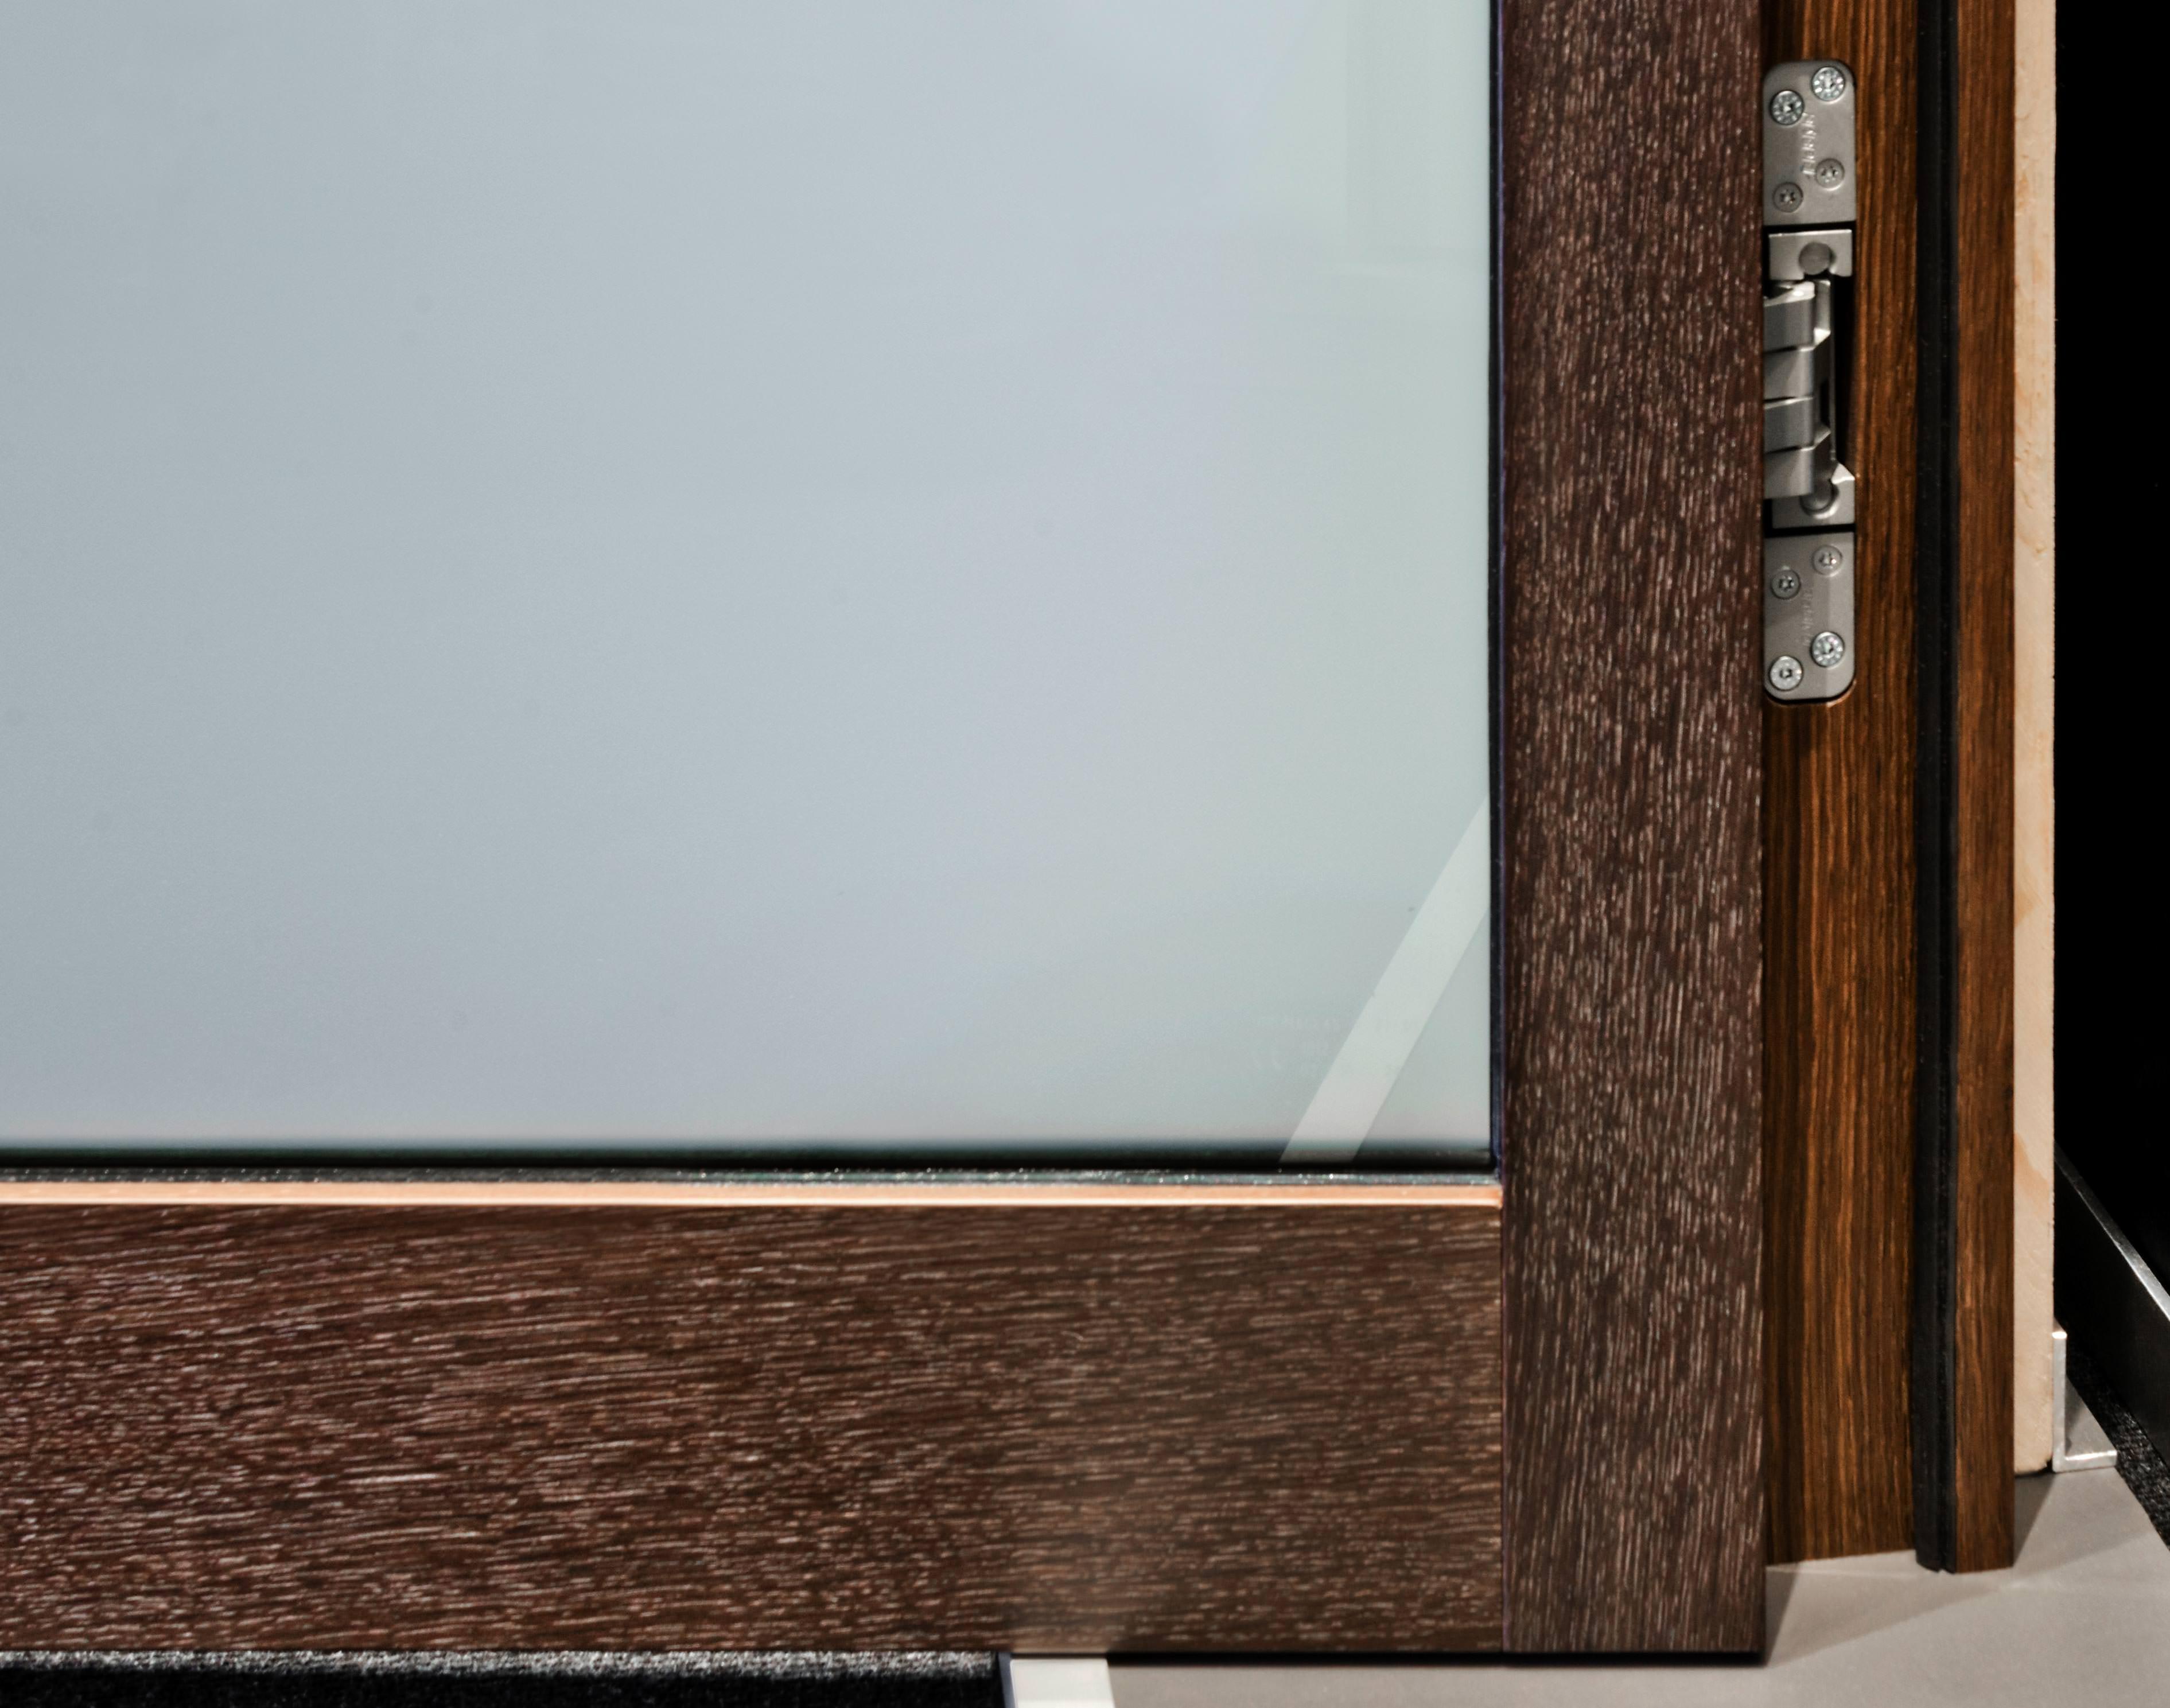 enorm transparent neue massivholz rahment r ohne glasleisten aber mit t30 brandschutzfunktion. Black Bedroom Furniture Sets. Home Design Ideas